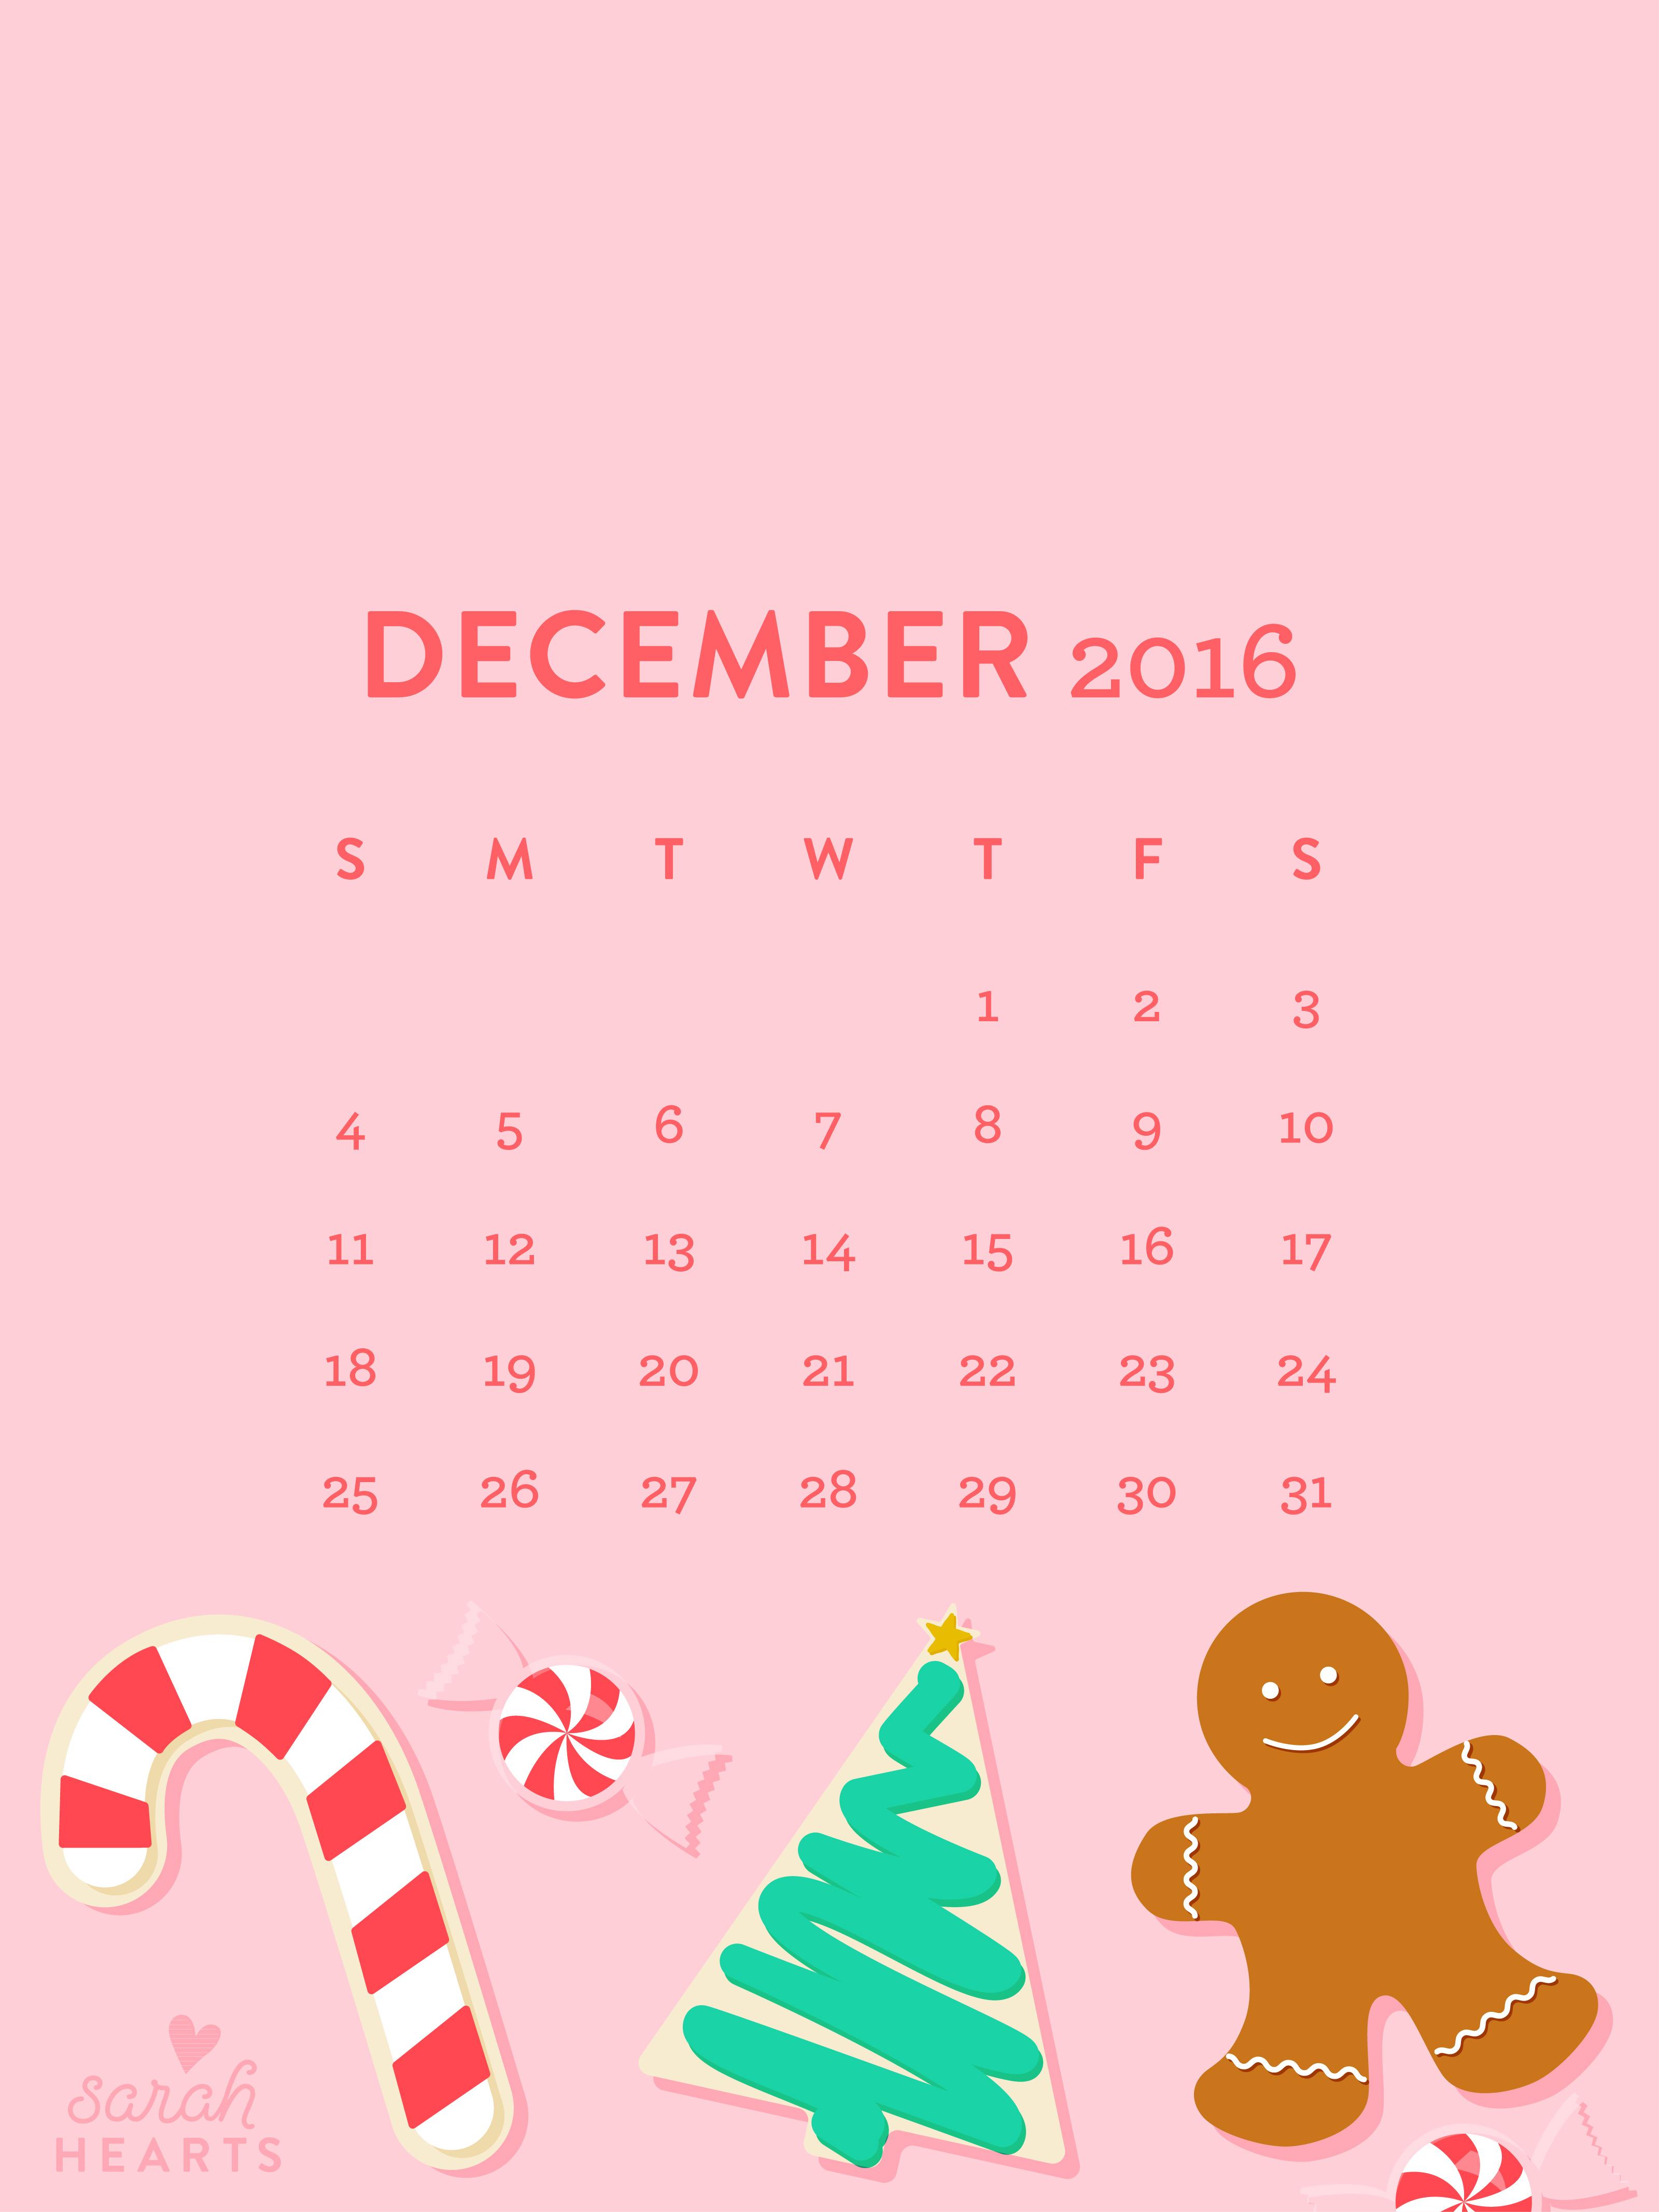 Cute Iphone Christmas Wallpapers December 2016 Christmas Cookie Calendar Wallpaper Sarah